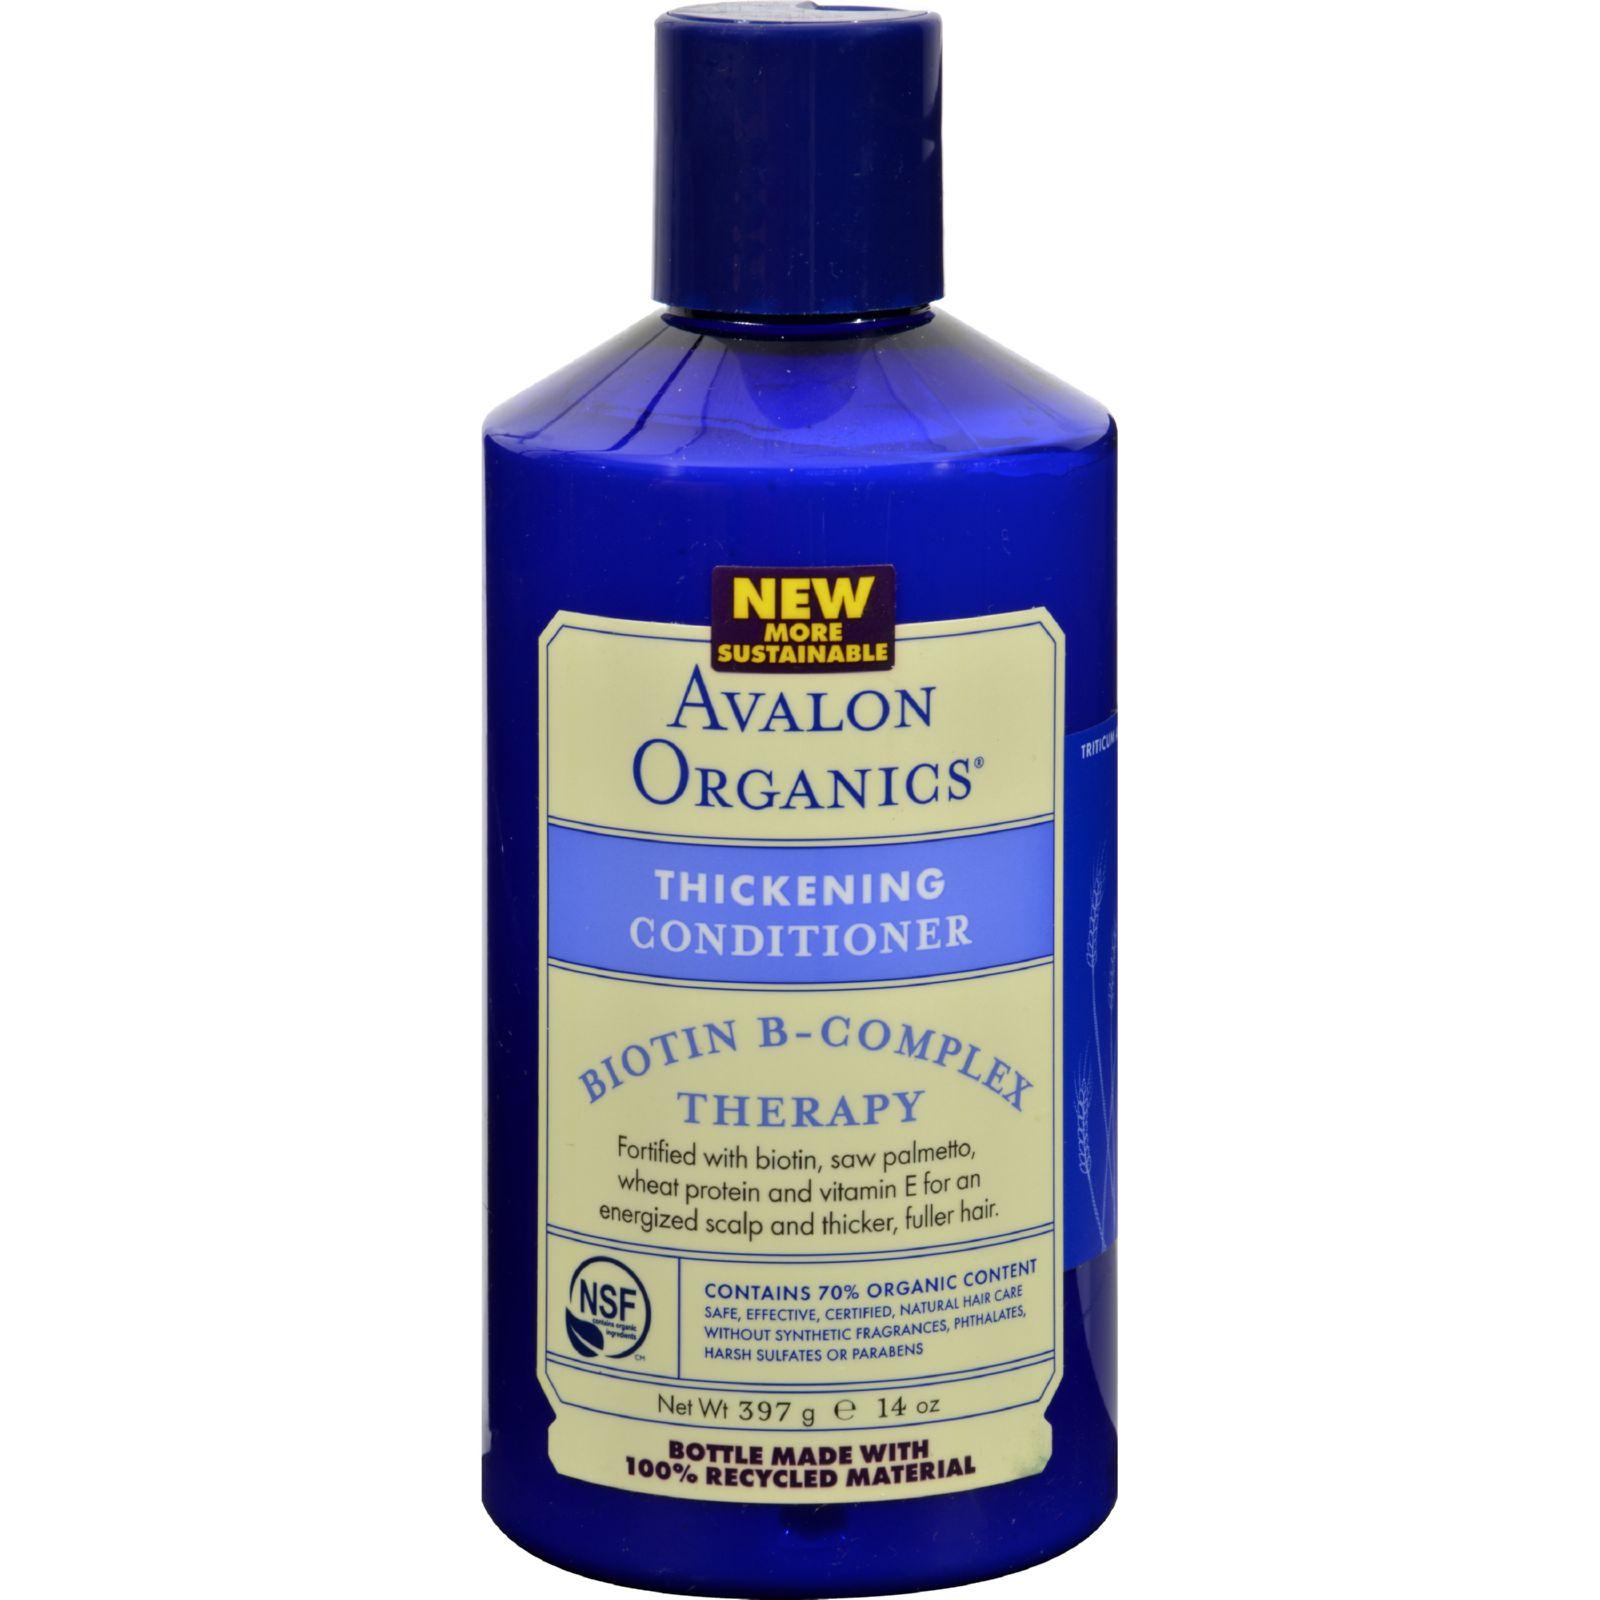 Avalon Organic Organics Thickening Conditioner Biotin B-C...